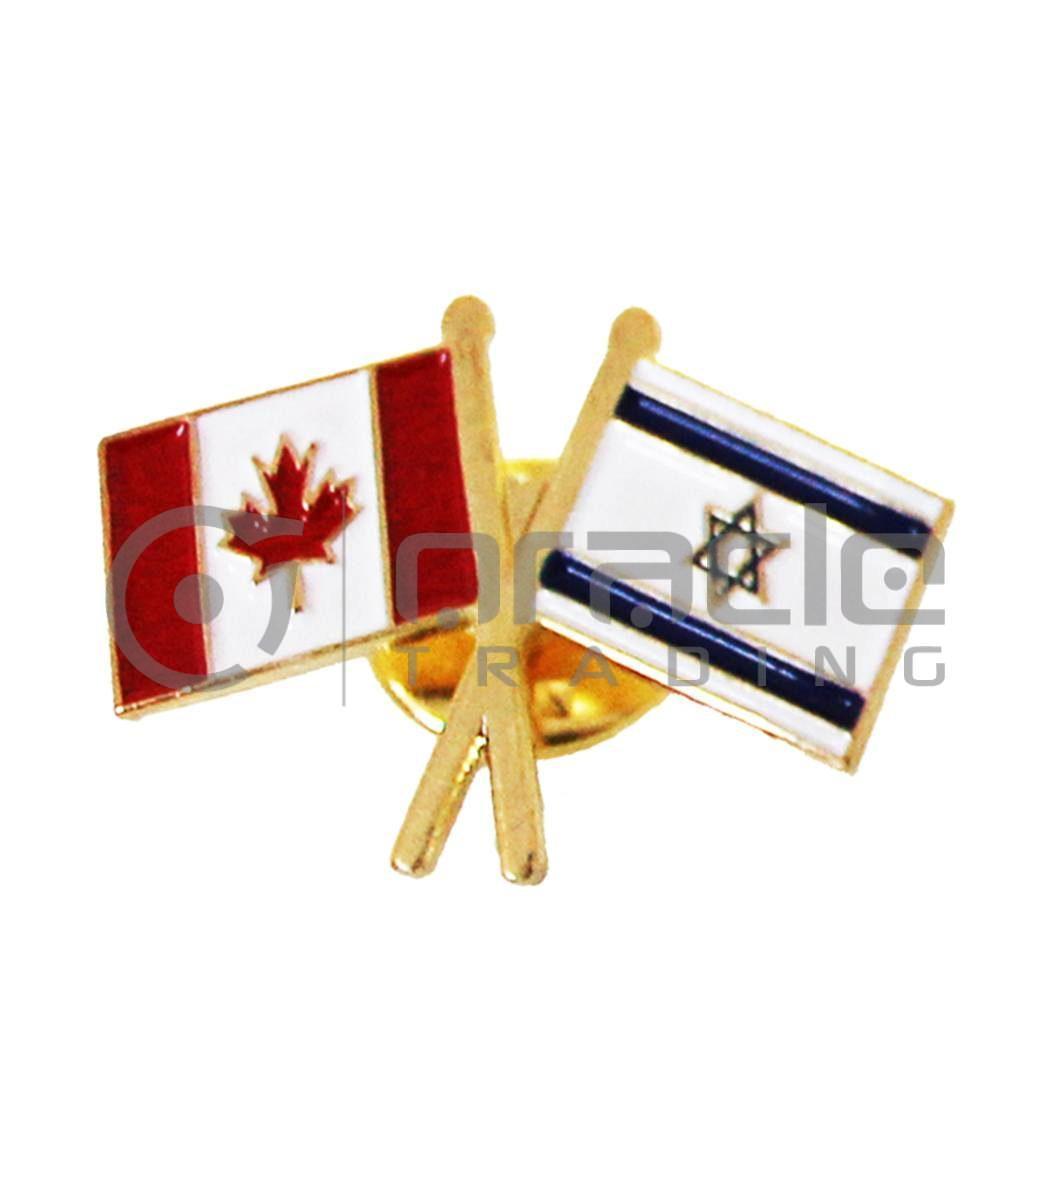 Israel / Canada Friendship Lapel Pin